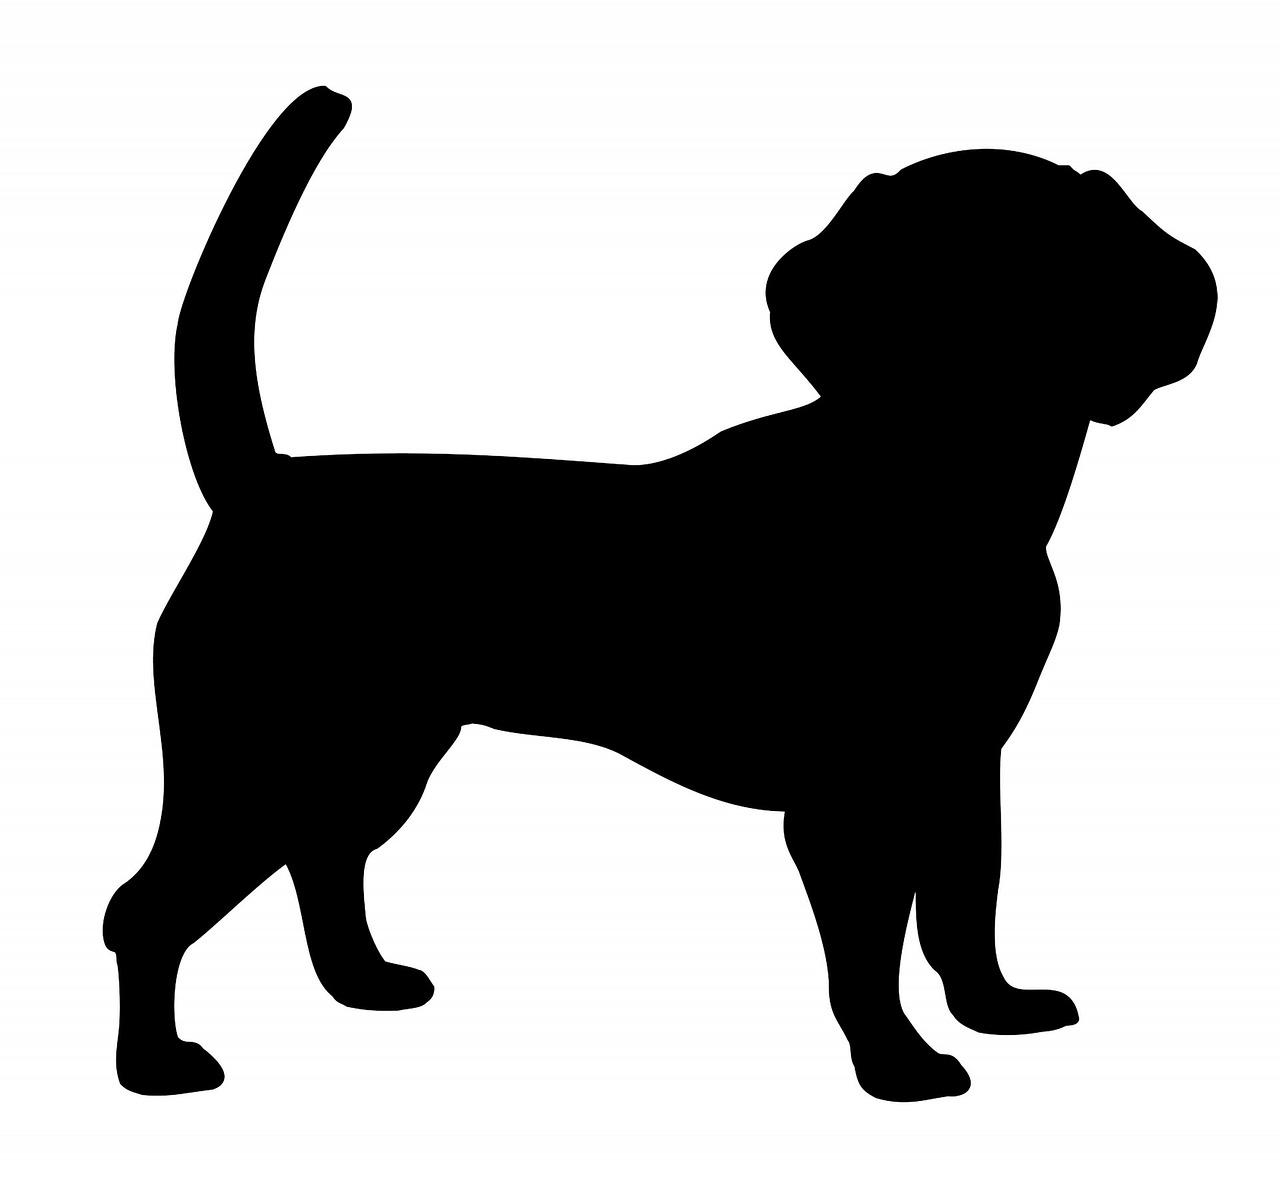 фото картинка силуэт собаки на прозрачном фоне его